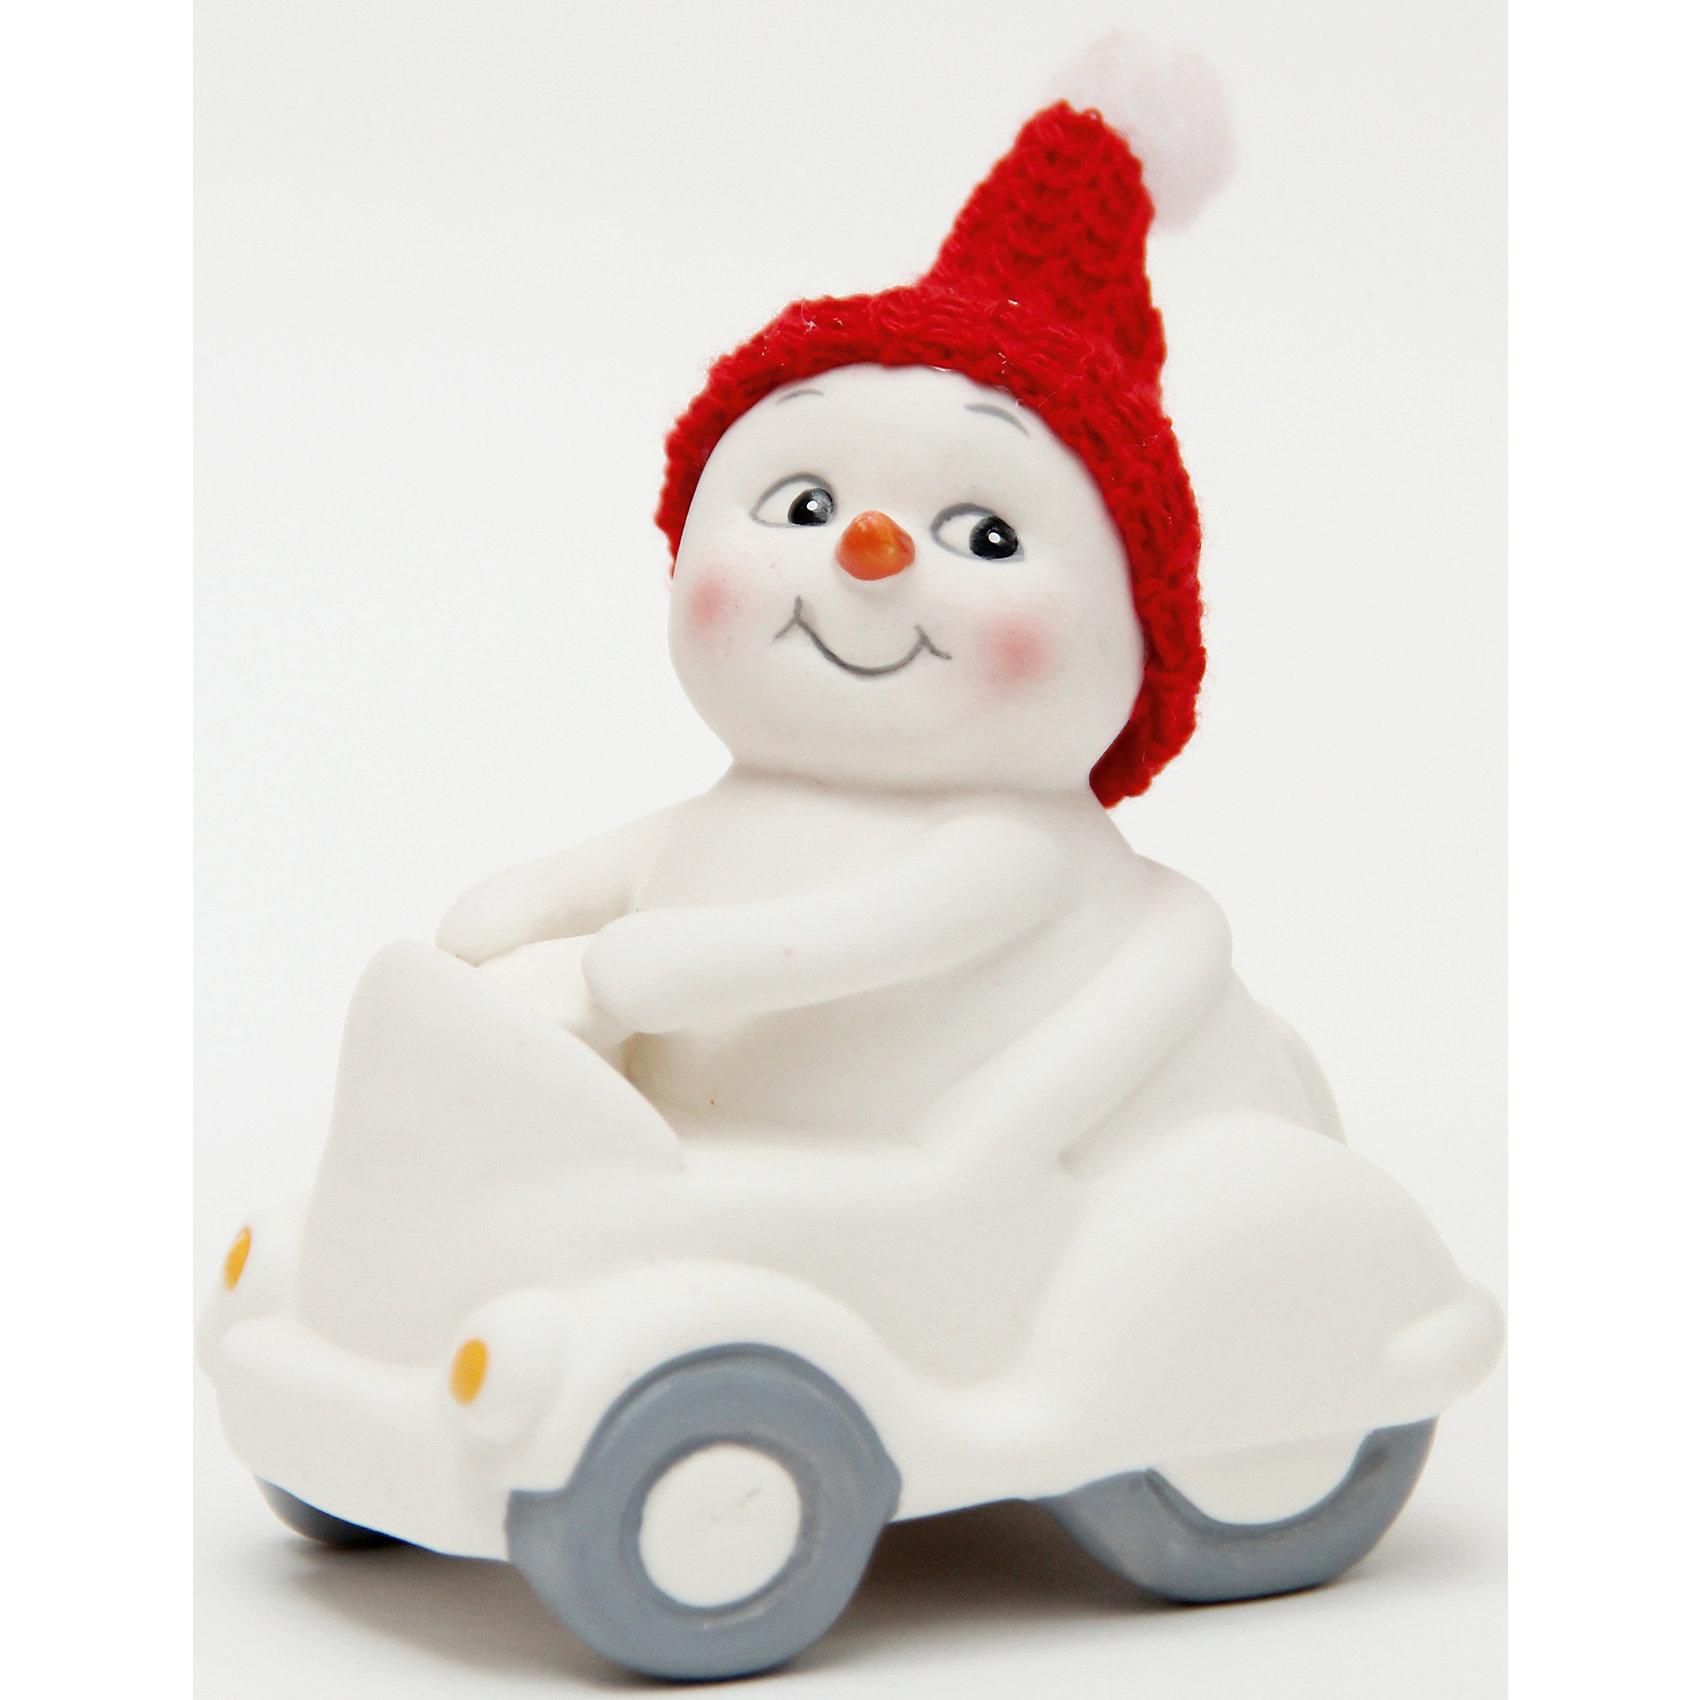 Новогодняя фигурка снеговика Снеговик в машине  (8см, керамика)Новогодняя фигурка снеговика Снеговик в машине  арт.41747 (8см, керамика) / 8 арт.41747<br><br>Ширина мм: 55<br>Глубина мм: 75<br>Высота мм: 80<br>Вес г: 133<br>Возраст от месяцев: 60<br>Возраст до месяцев: 600<br>Пол: Унисекс<br>Возраст: Детский<br>SKU: 5144564